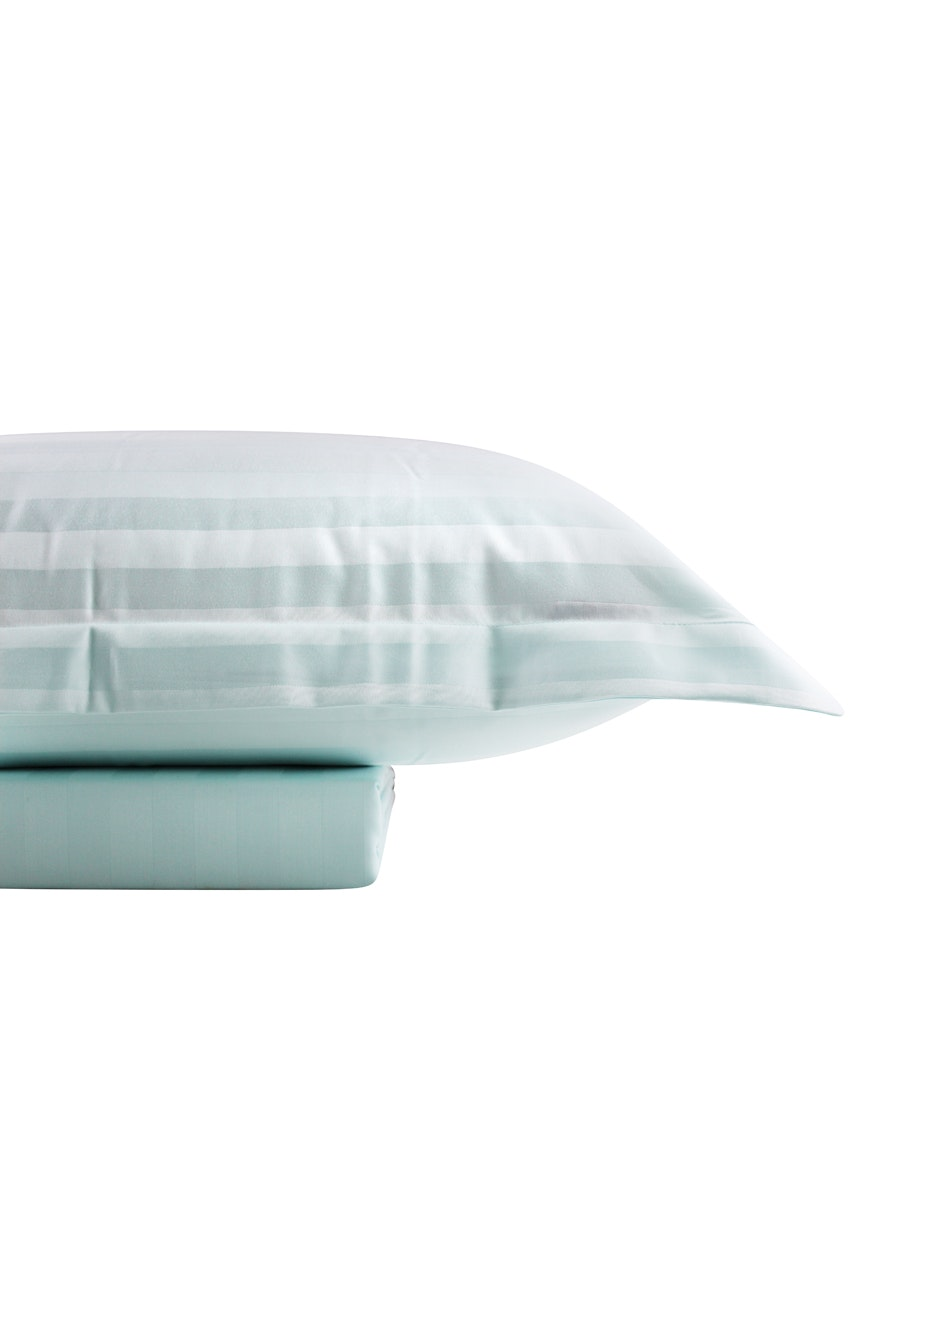 1000 Thread Count - Cotton Rich Quilt Cover Set Sateen Stripe - Mint - Queen Bed